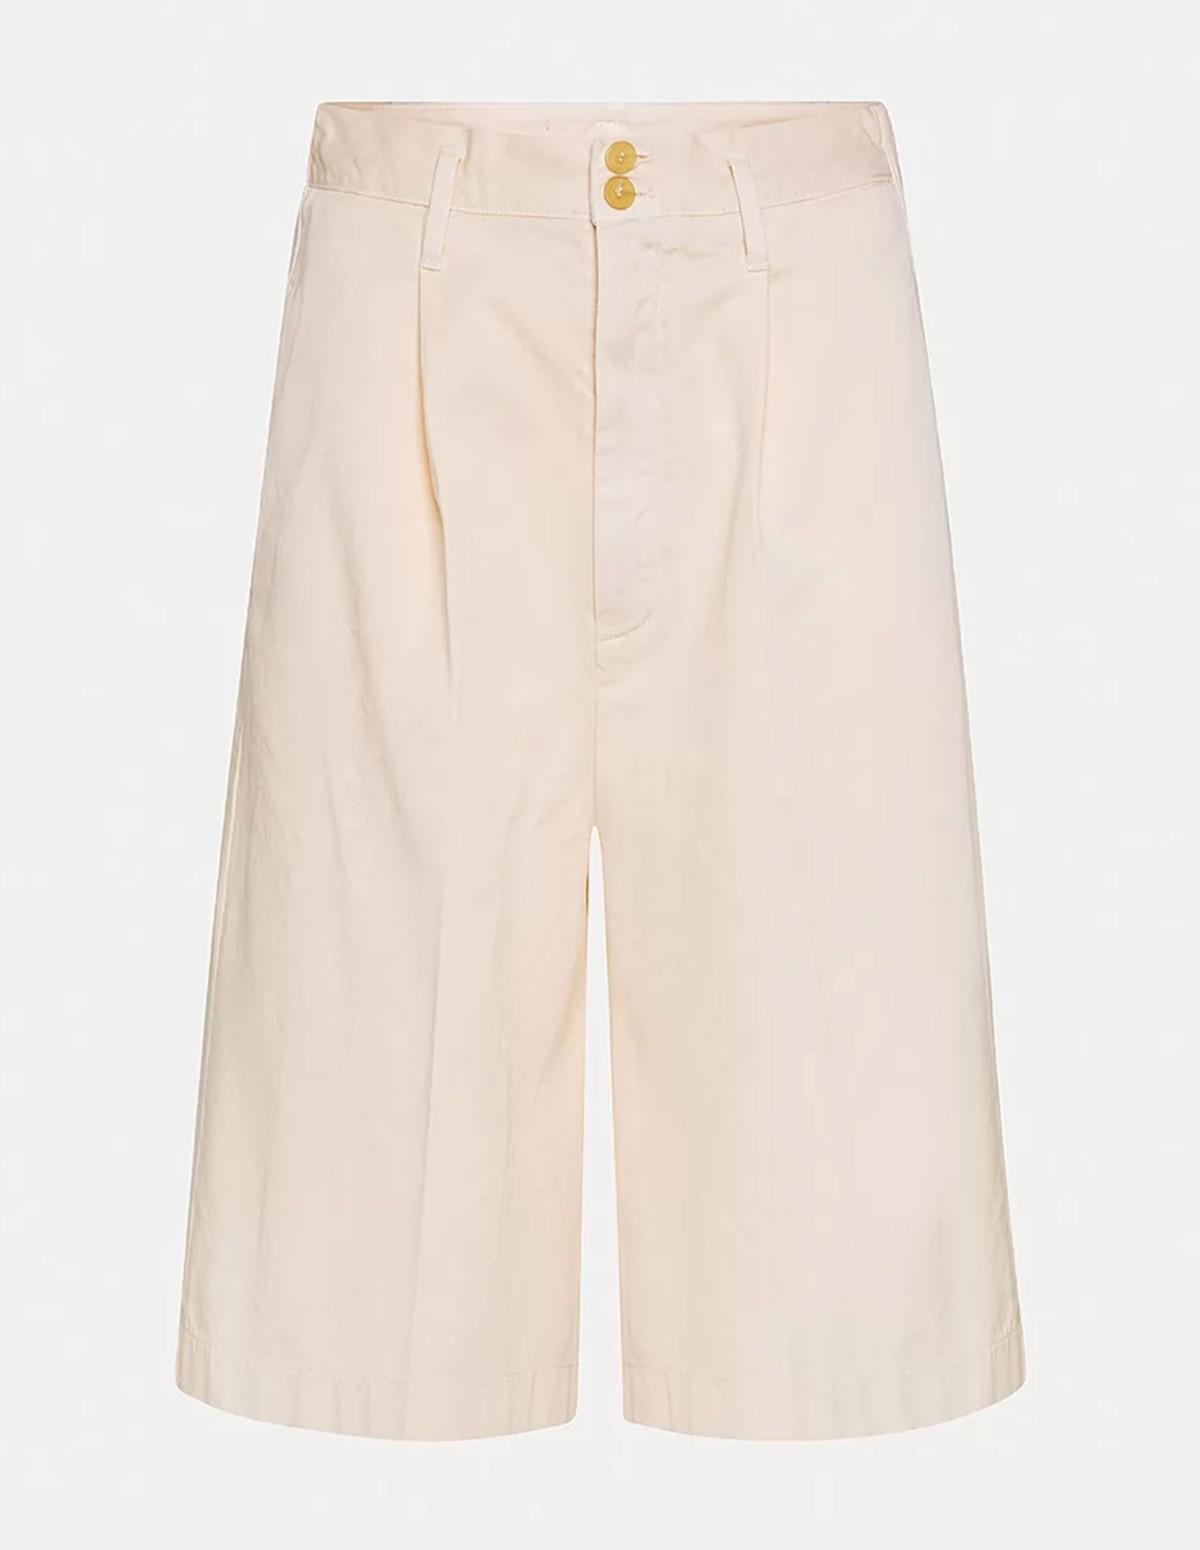 Forte 8031 Pants - IVORY